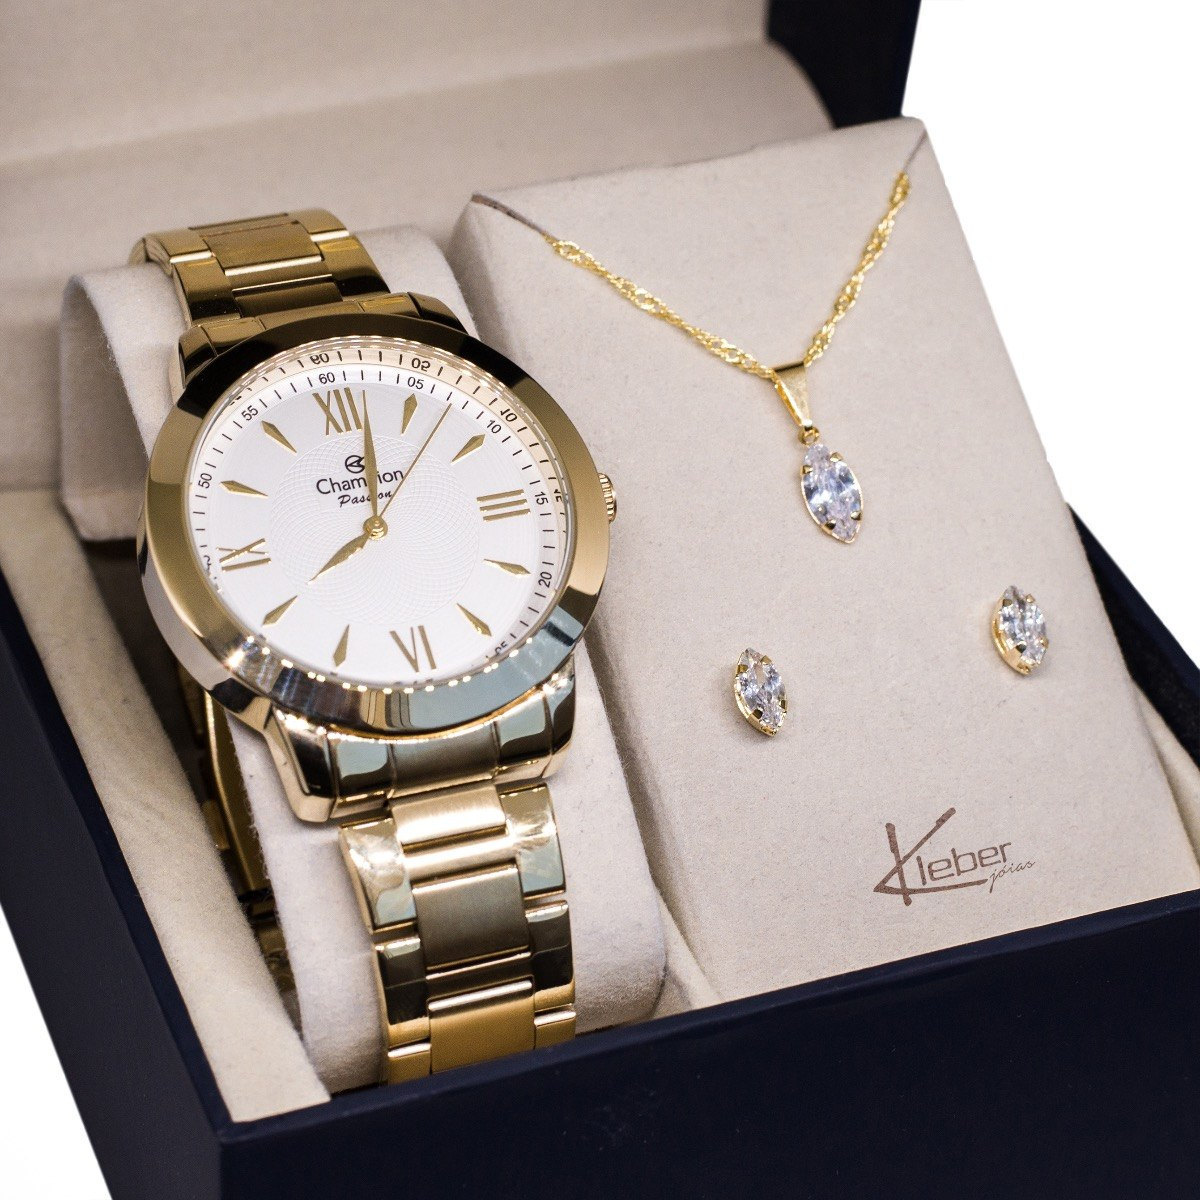 0099902cfbc relógio champion feminino dourado ch24697h kit colar brincos. Carregando  zoom.